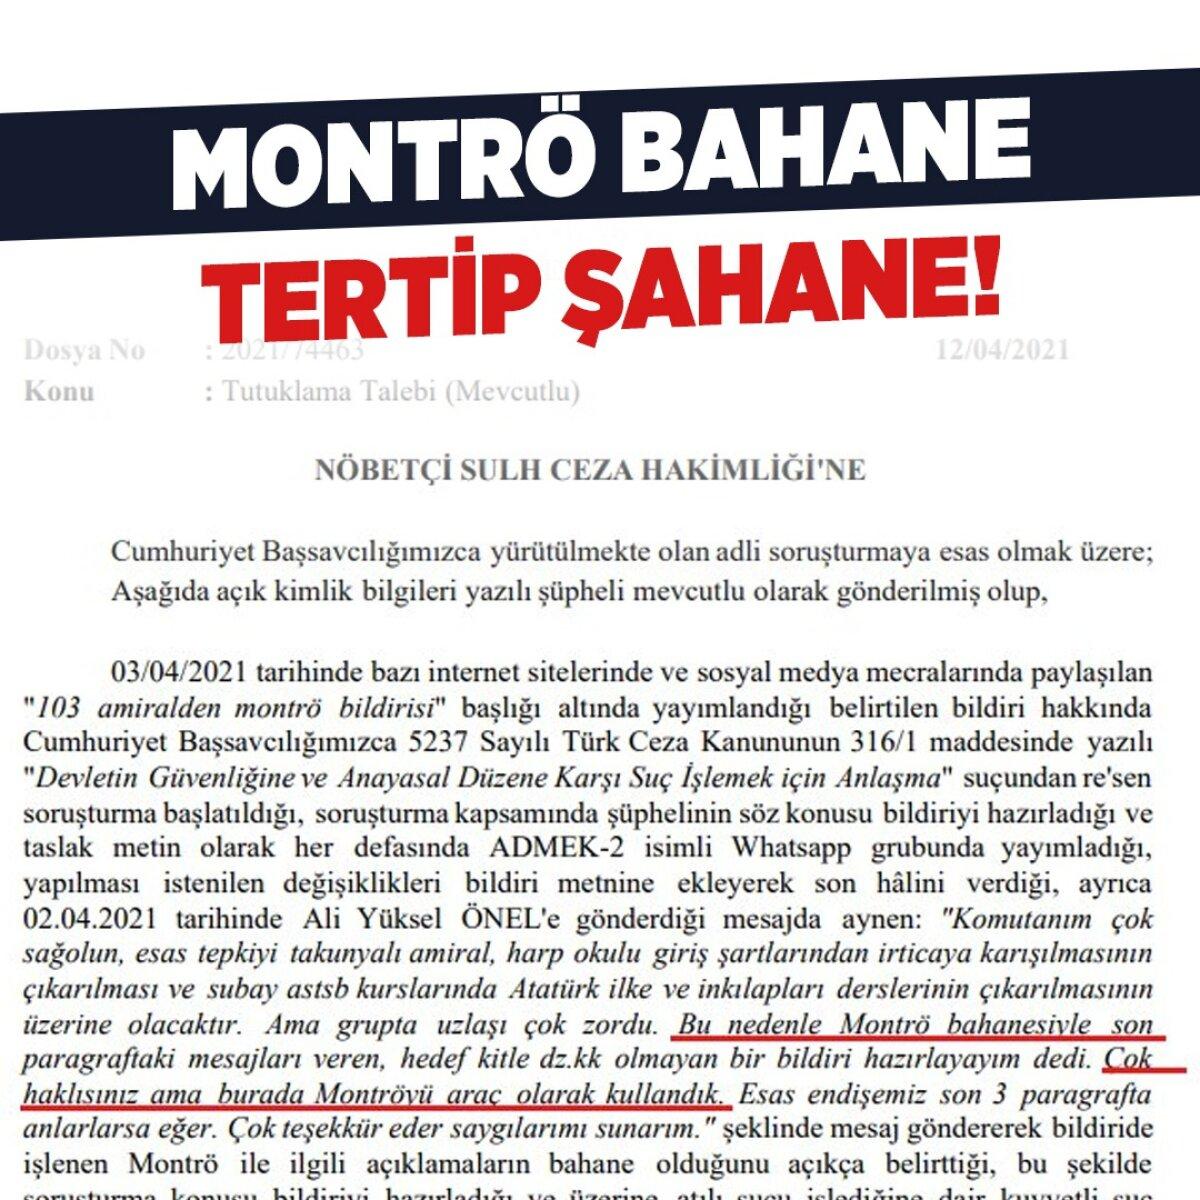 MONTRÖ BAHANE TERTİP ŞAHANE